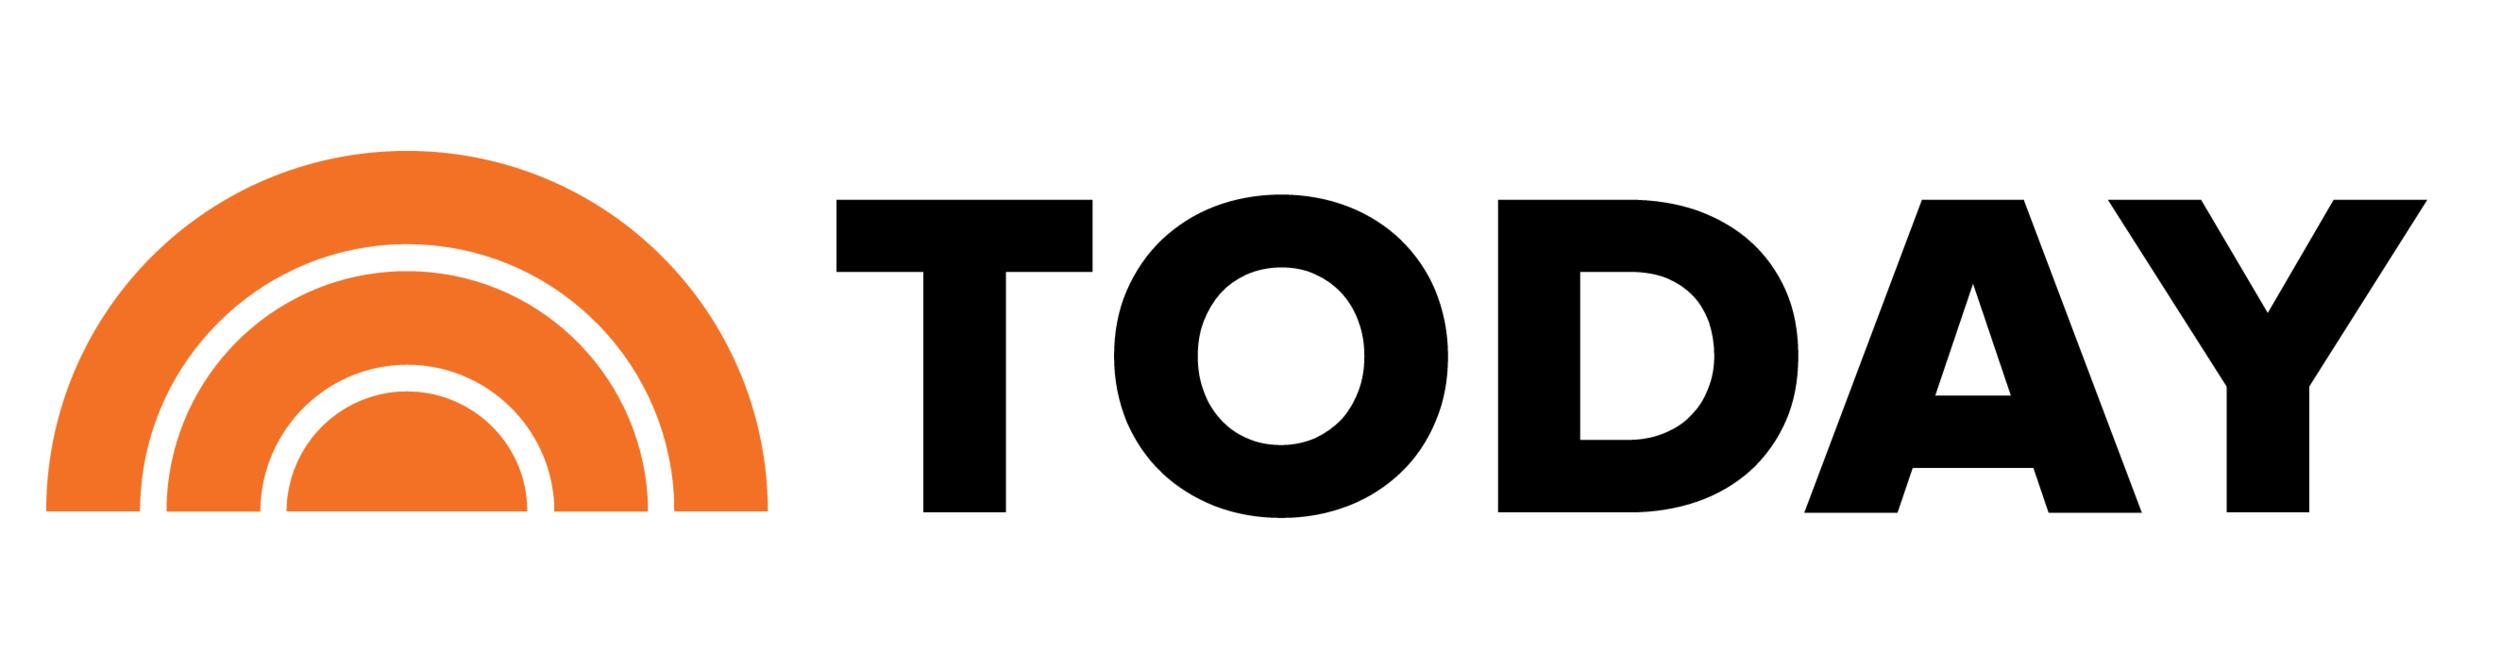 press-logo-today.png